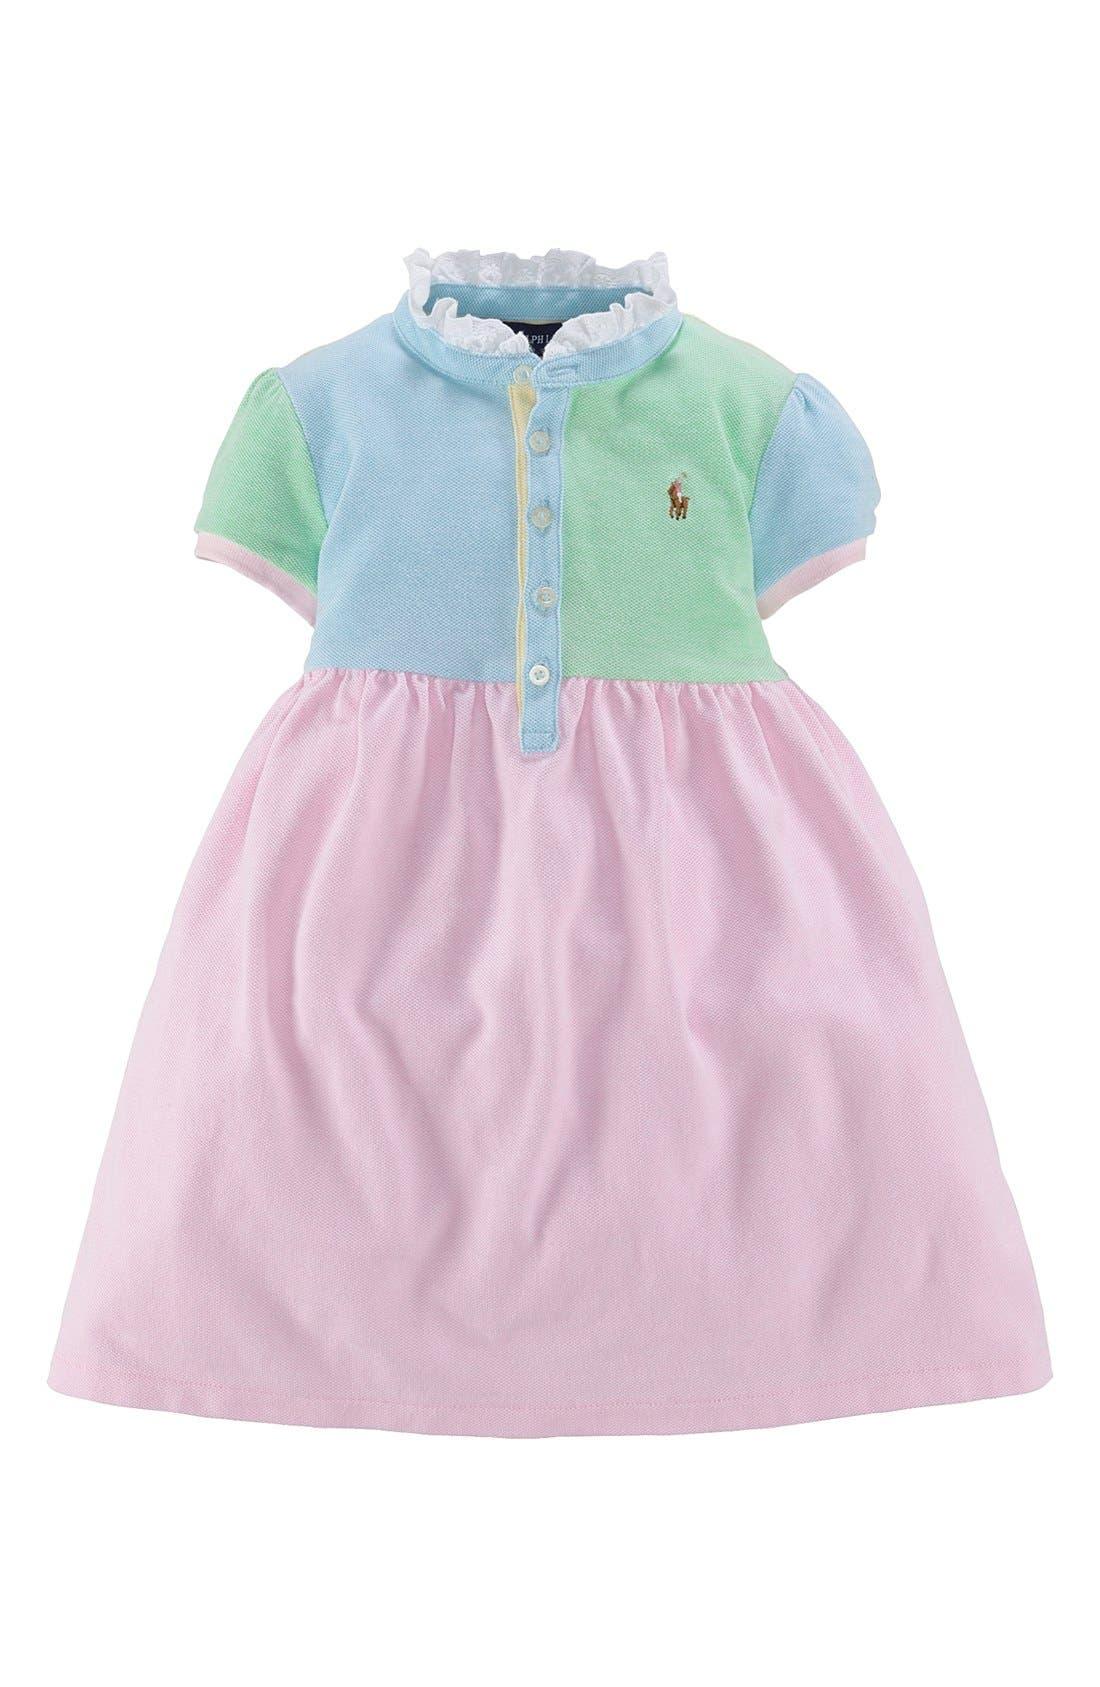 Main Image - Ralph Lauren Colorblock Dress (Toddler Girls)